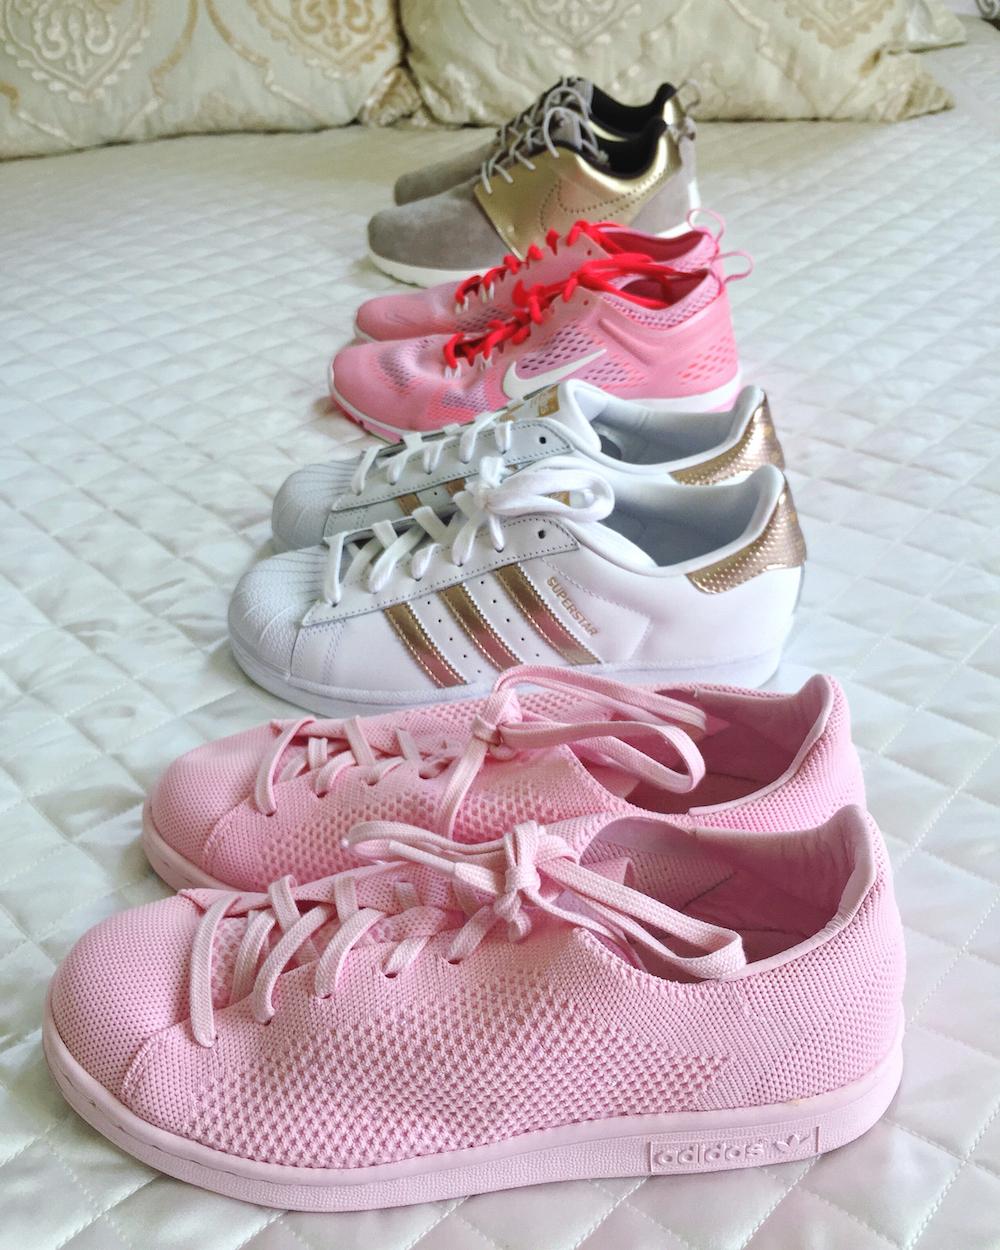 Adidas_Superstar_ManhattanGirl